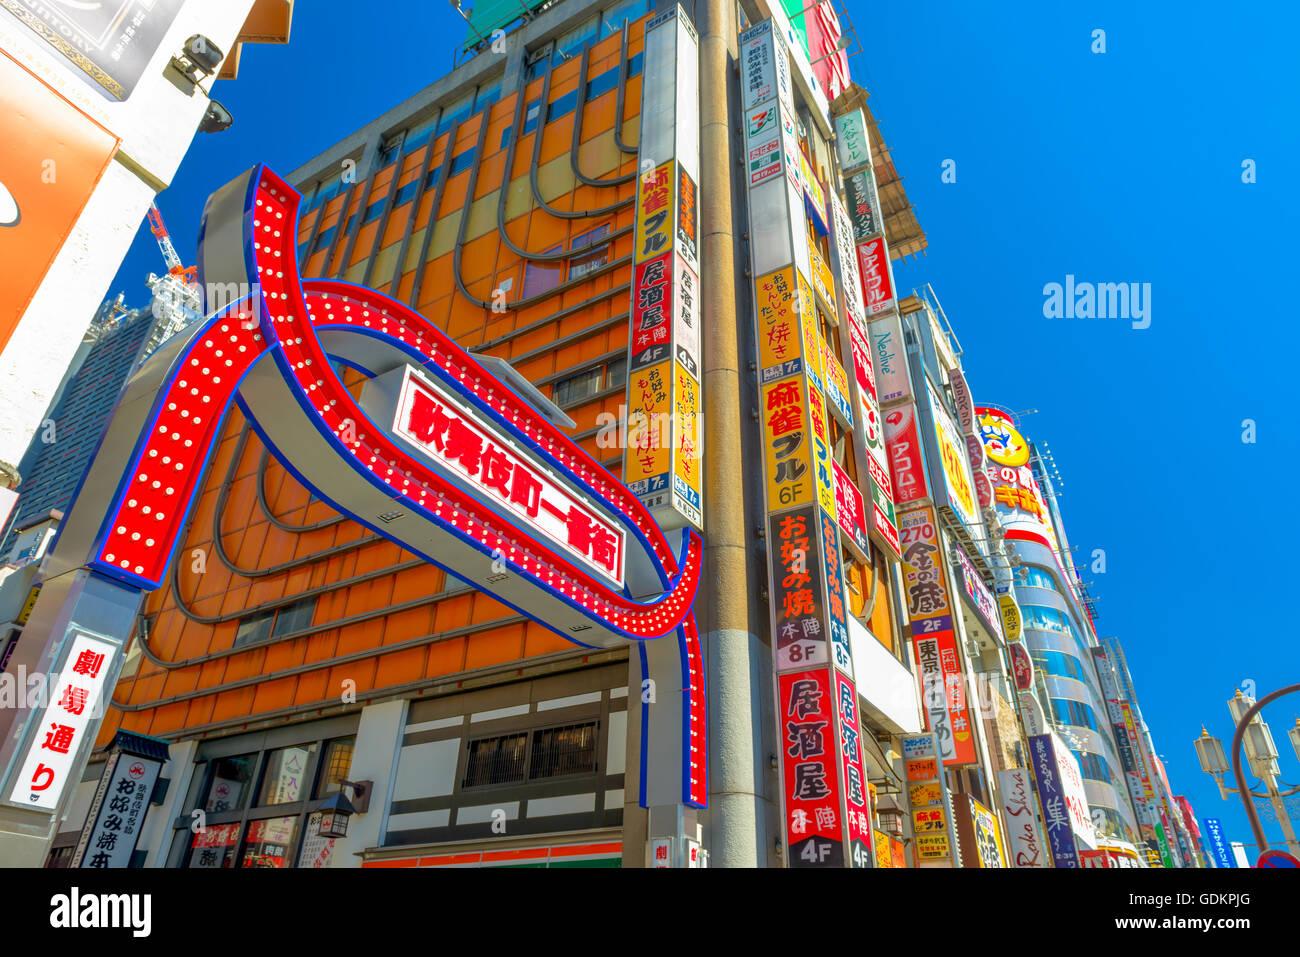 Sign marking the entrance to the main alleyway in Kabuki-cho, Shinjuku, Tokyo, Japan. - Stock Image